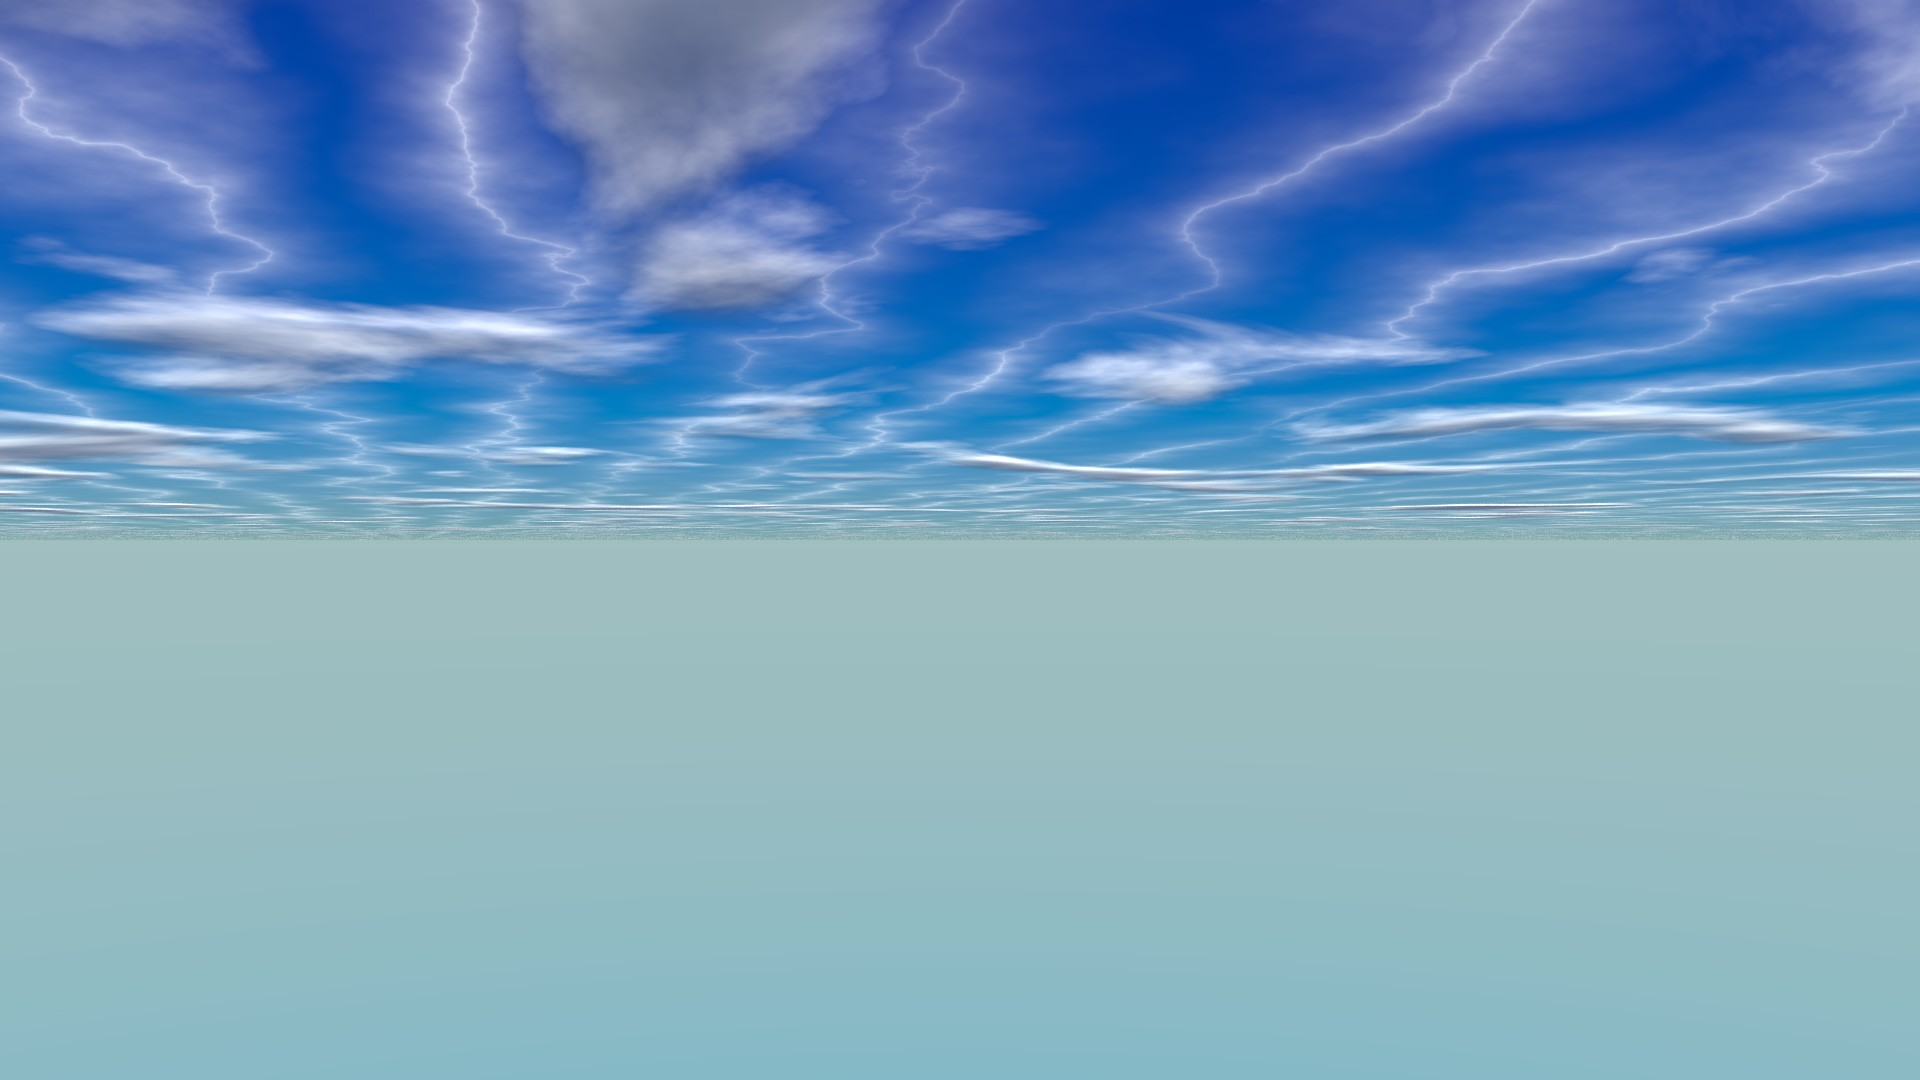 Sky free-nube2.jpg